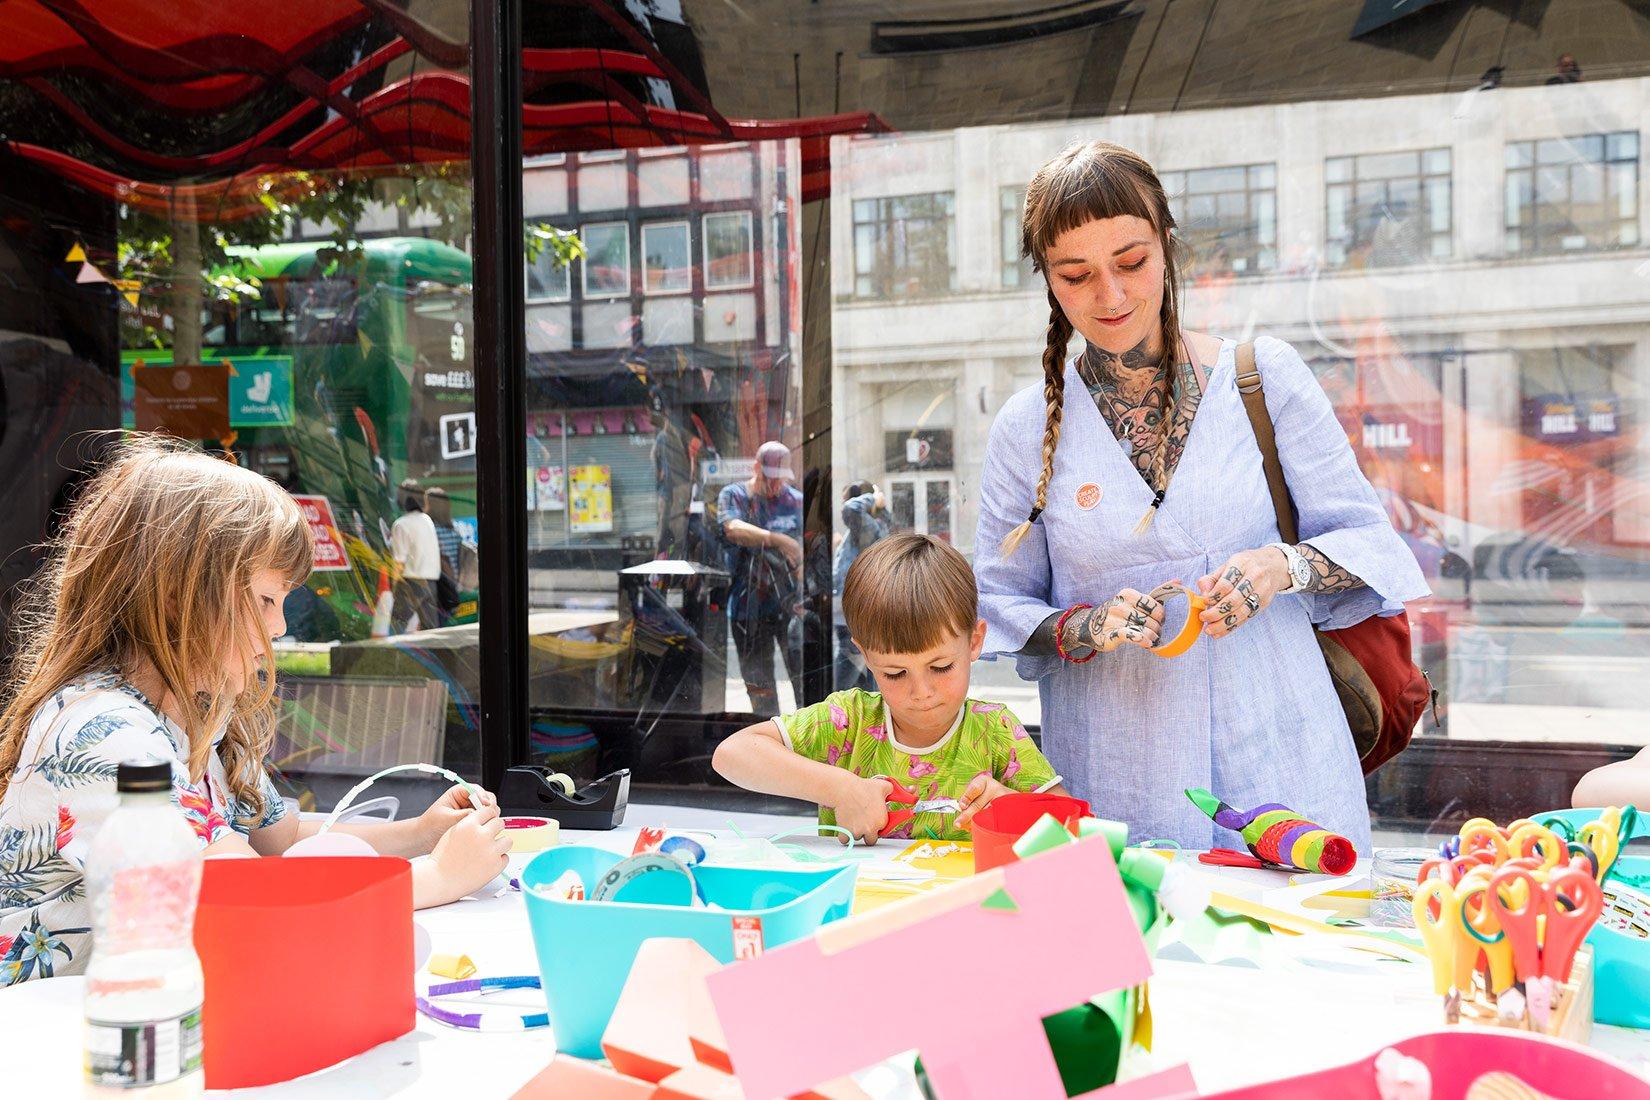 Create, Sculpt, Play 2019, outside Victoria Gardens, Leeds, woman, children activities